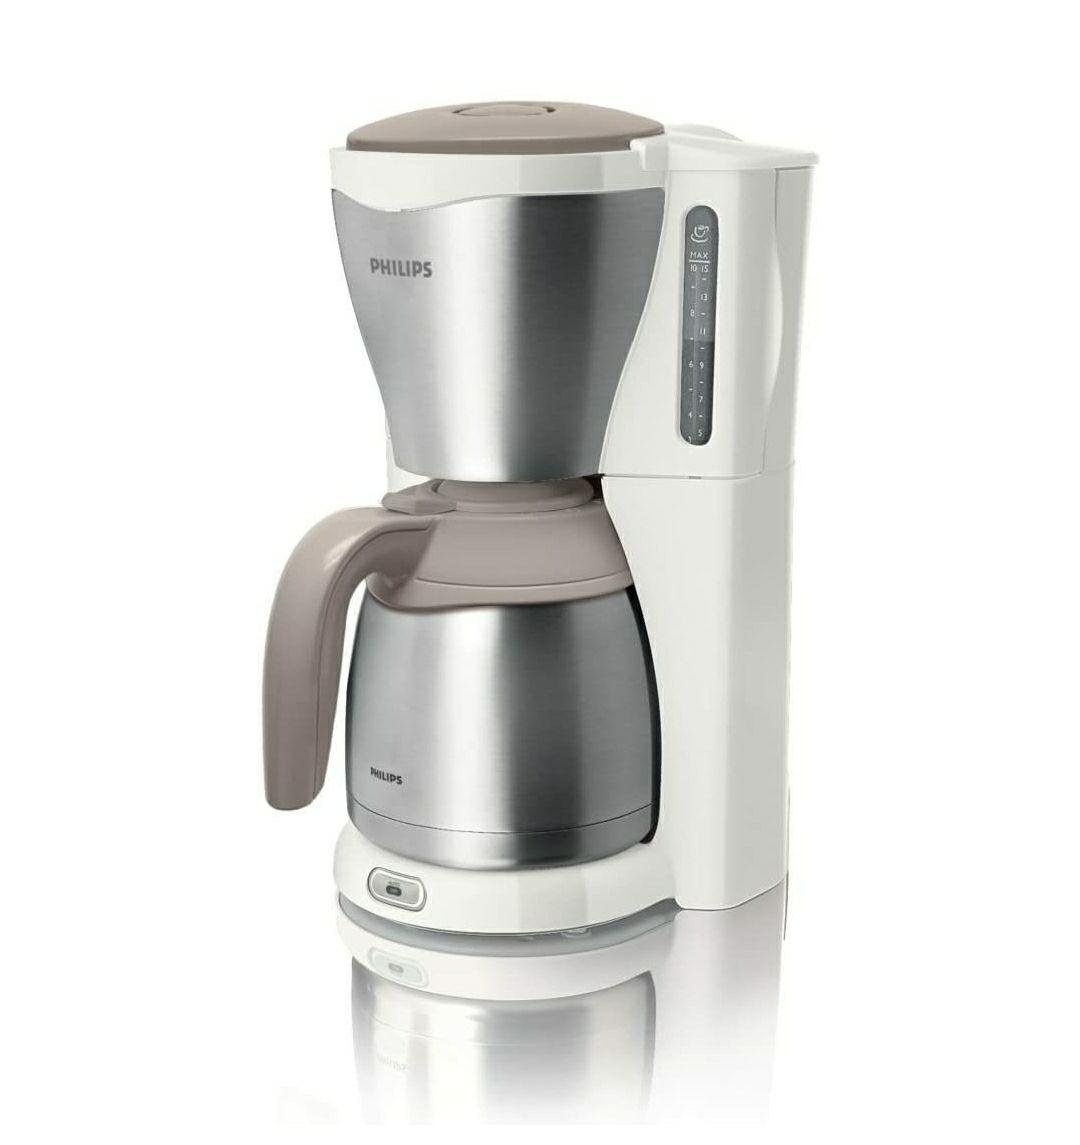 Cafetera - Philips Viva HD7546/00 (reaco muy bueno)